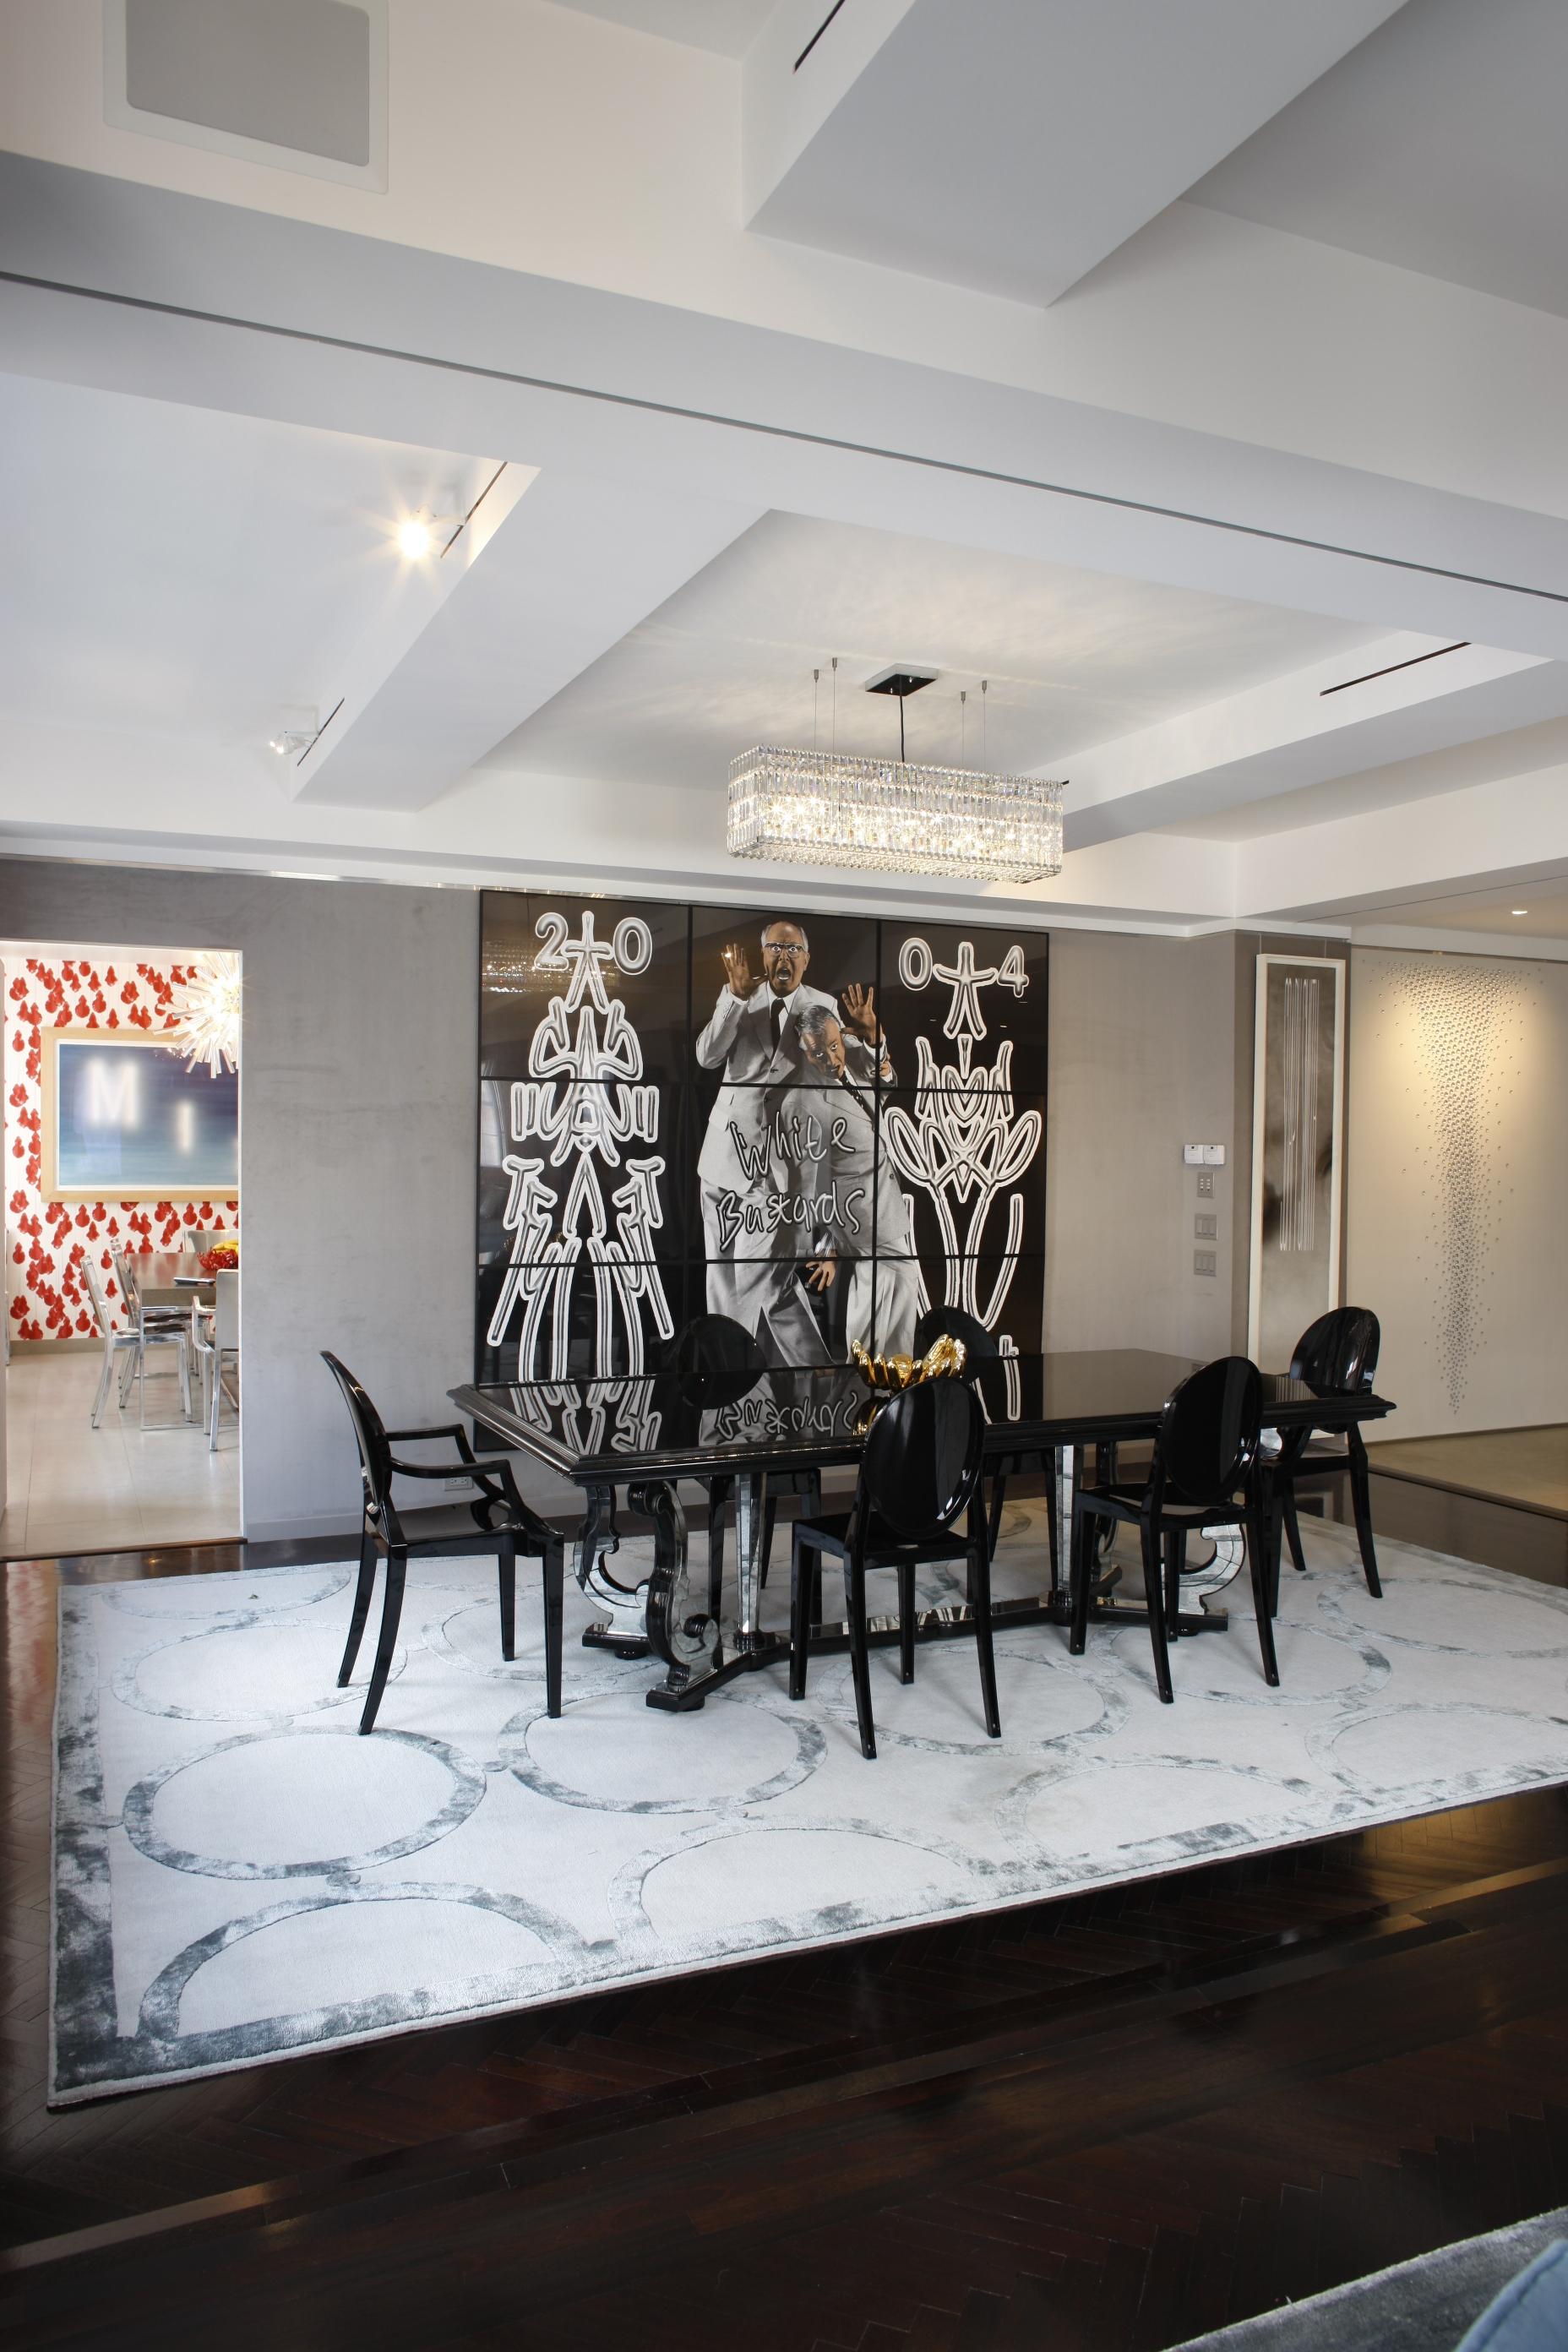 sophie-harrison-amathea-luxury-interior-design-for-professional-women-_29Q8031.JPG